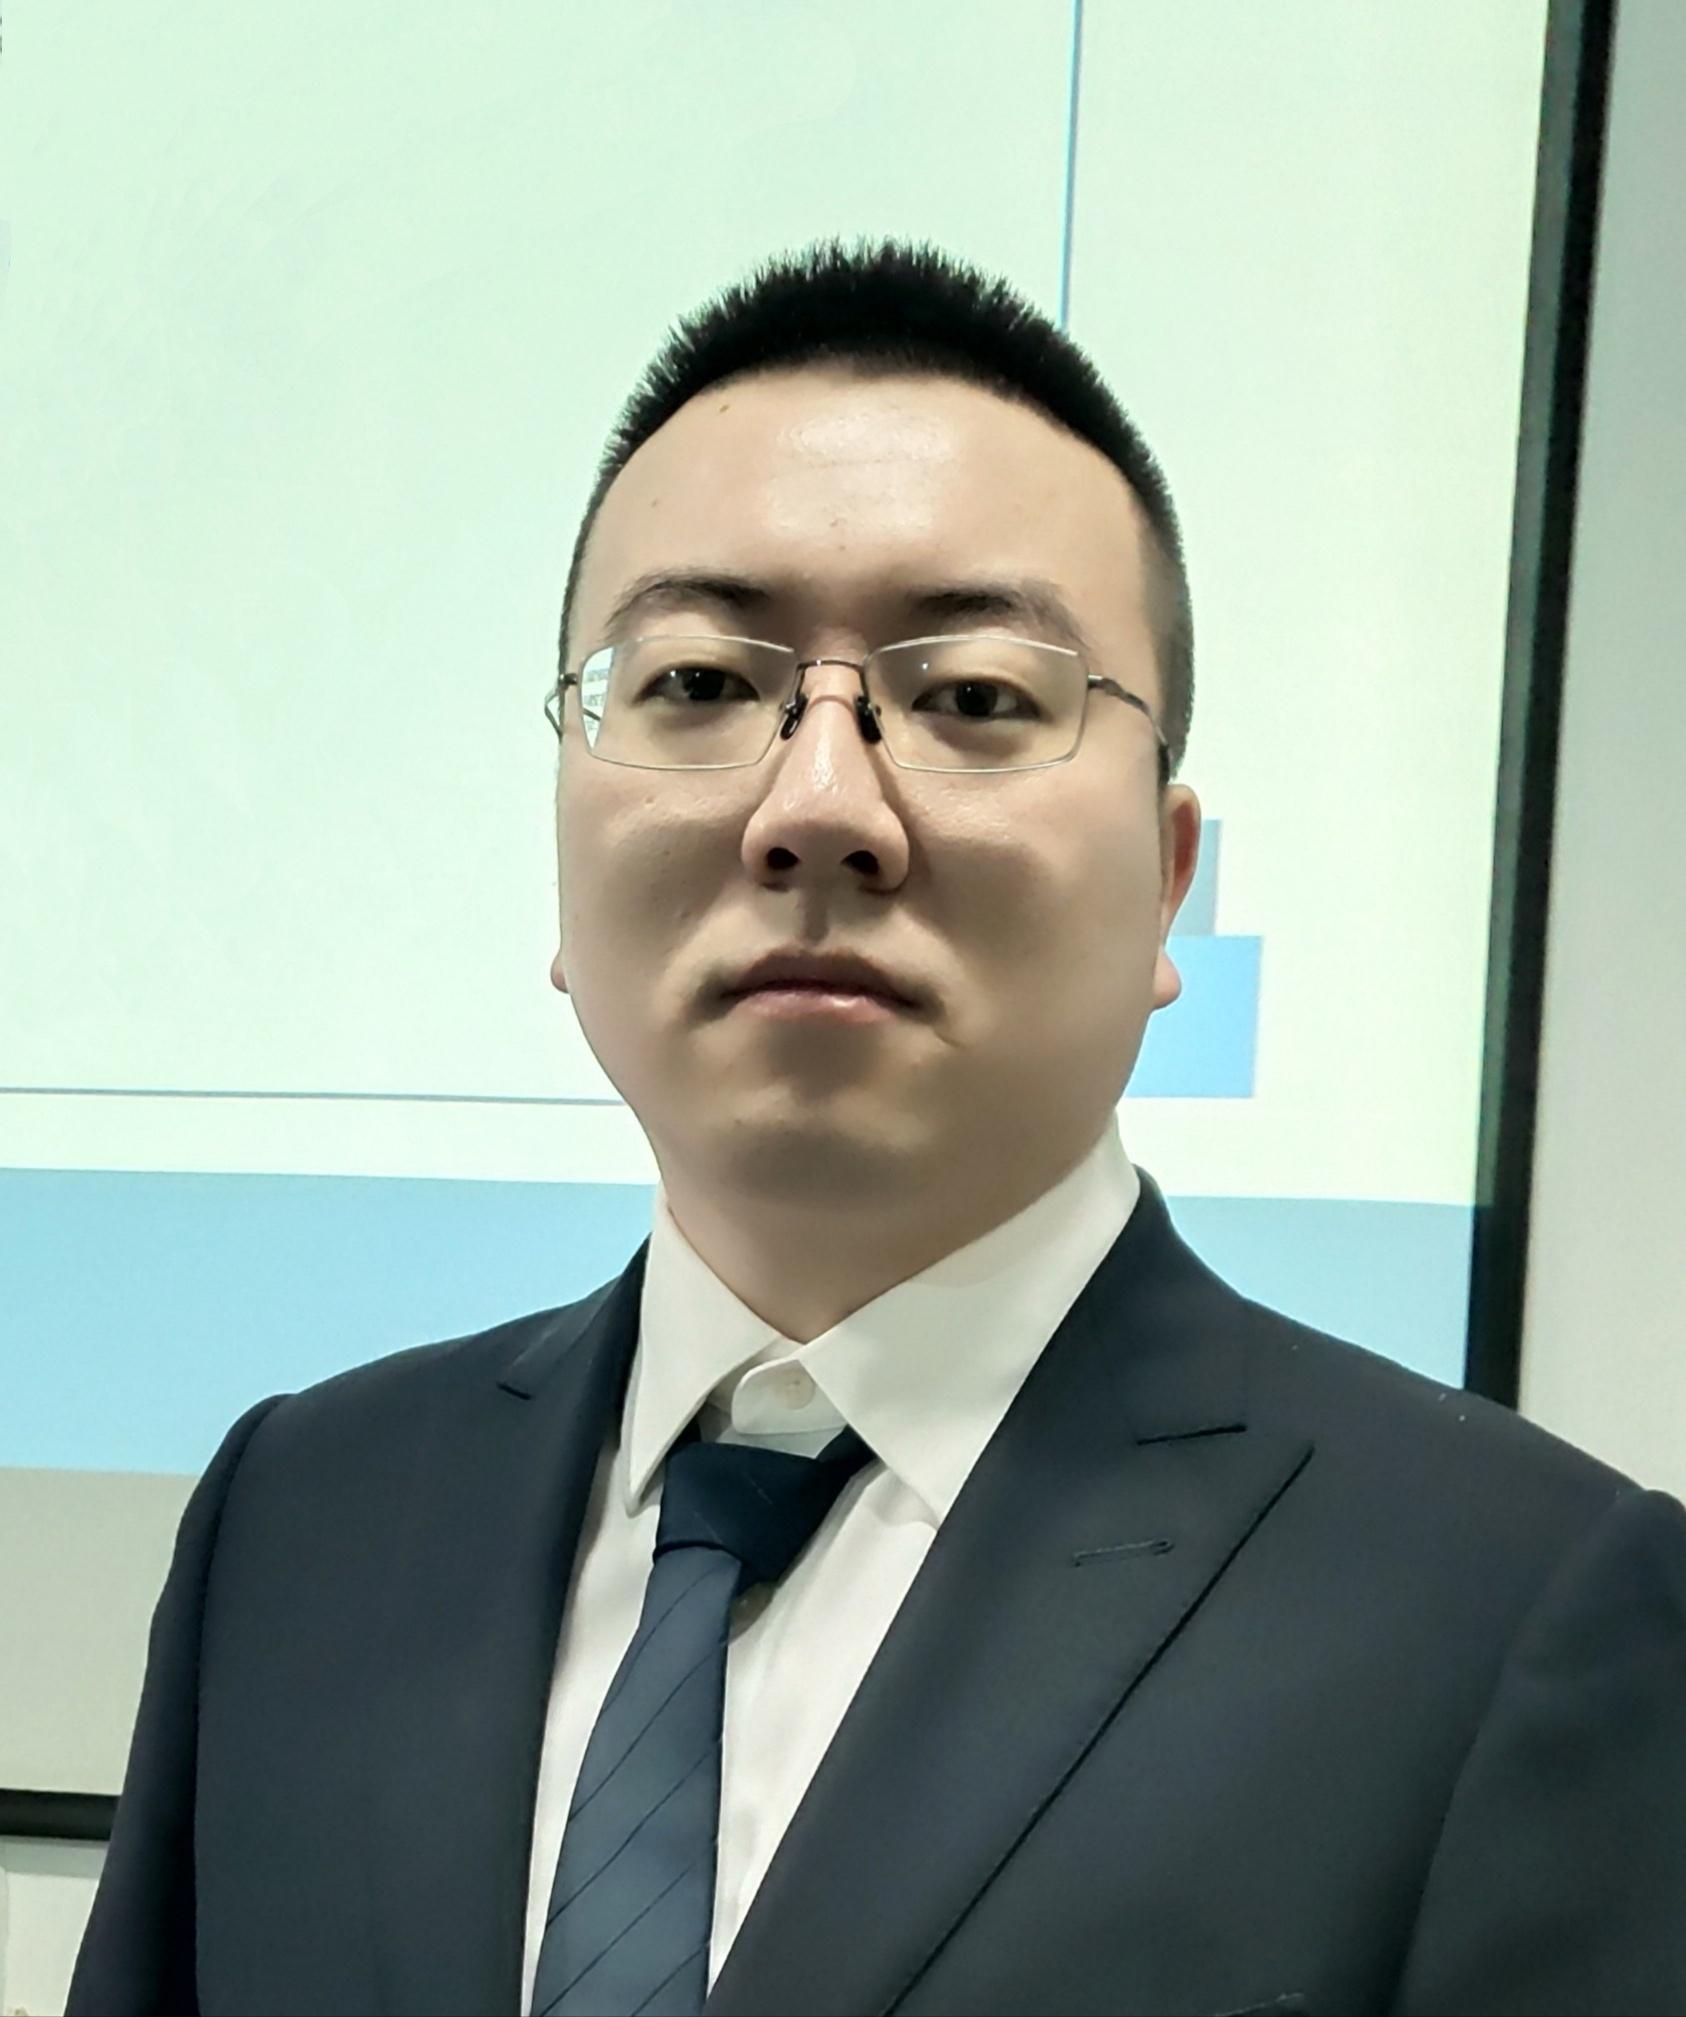 Liangjun Chen